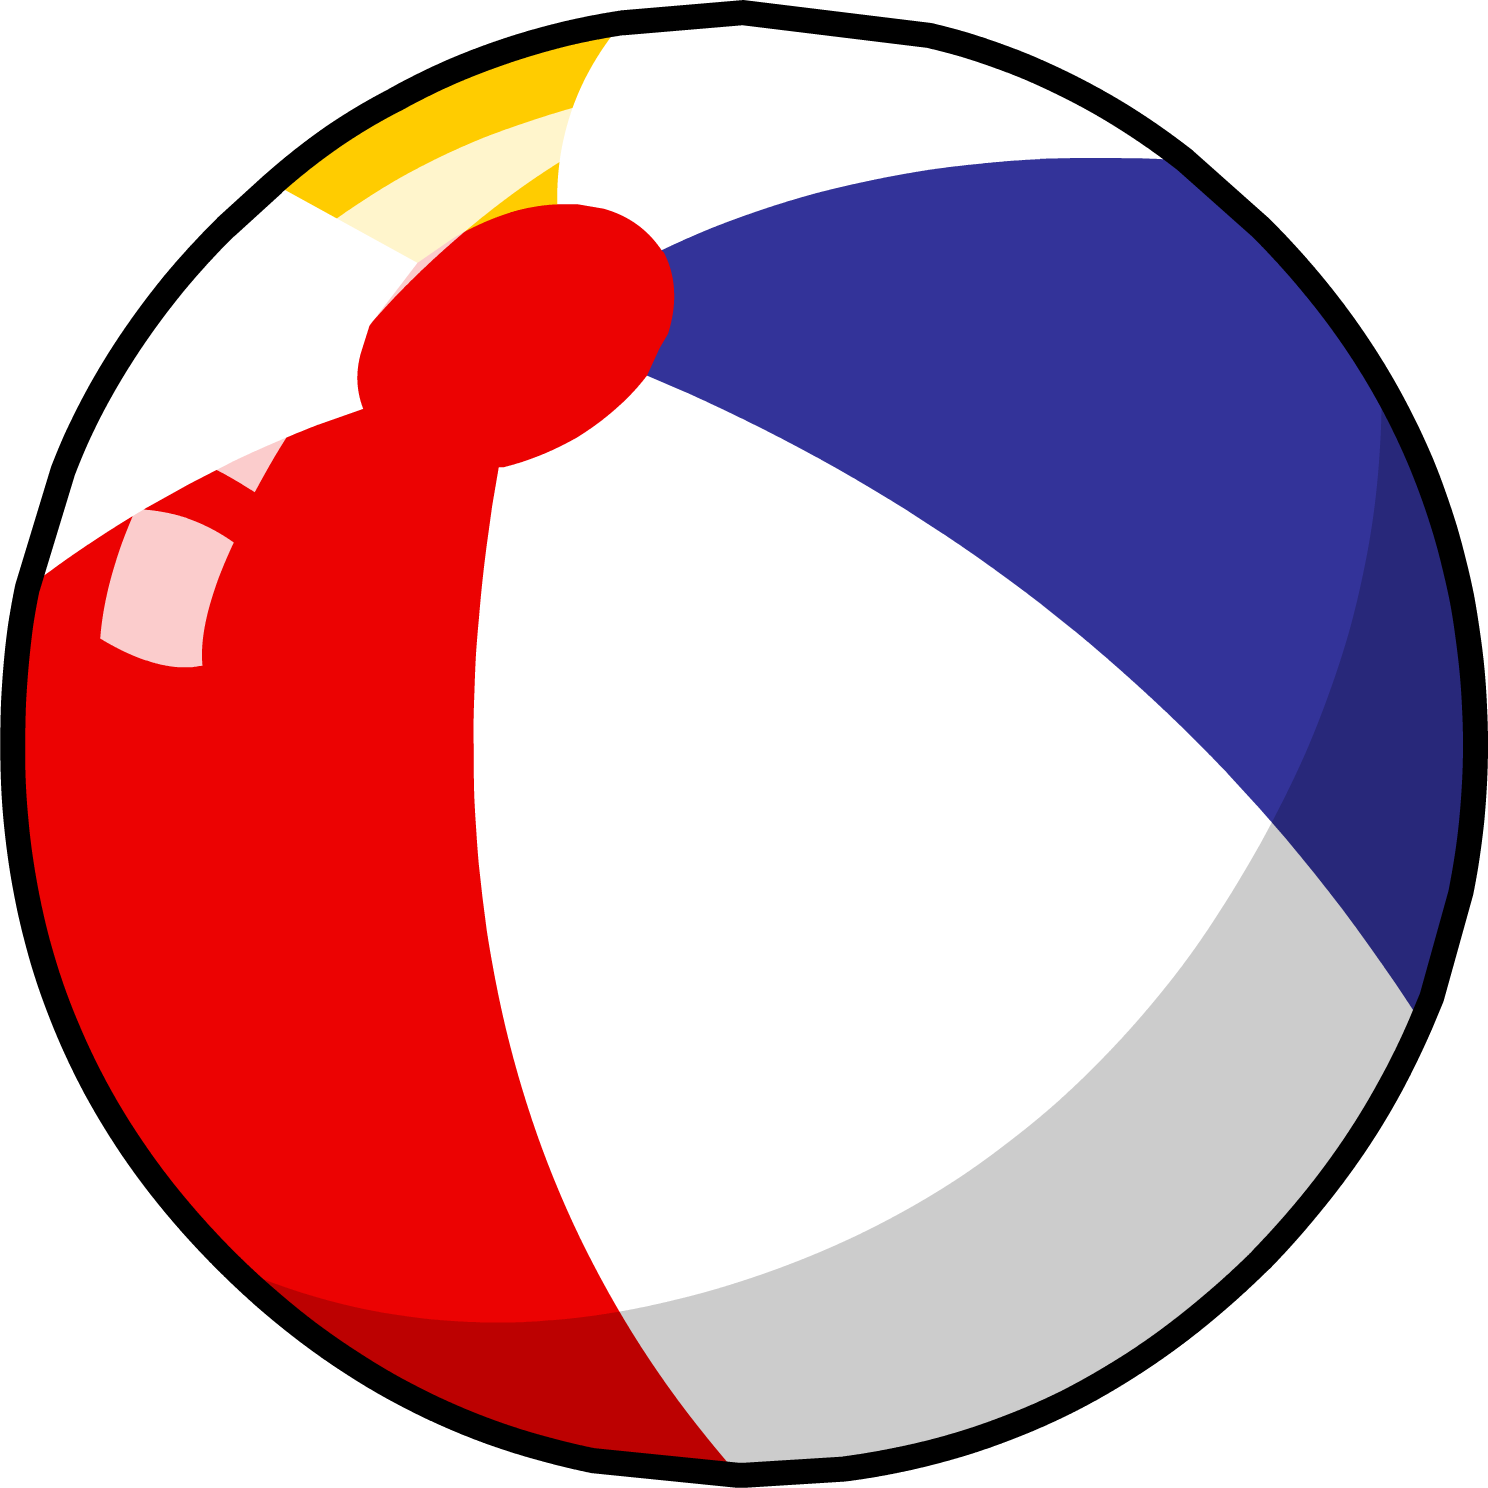 graphic transparent stock Beach ball gear free. Beachball clipart